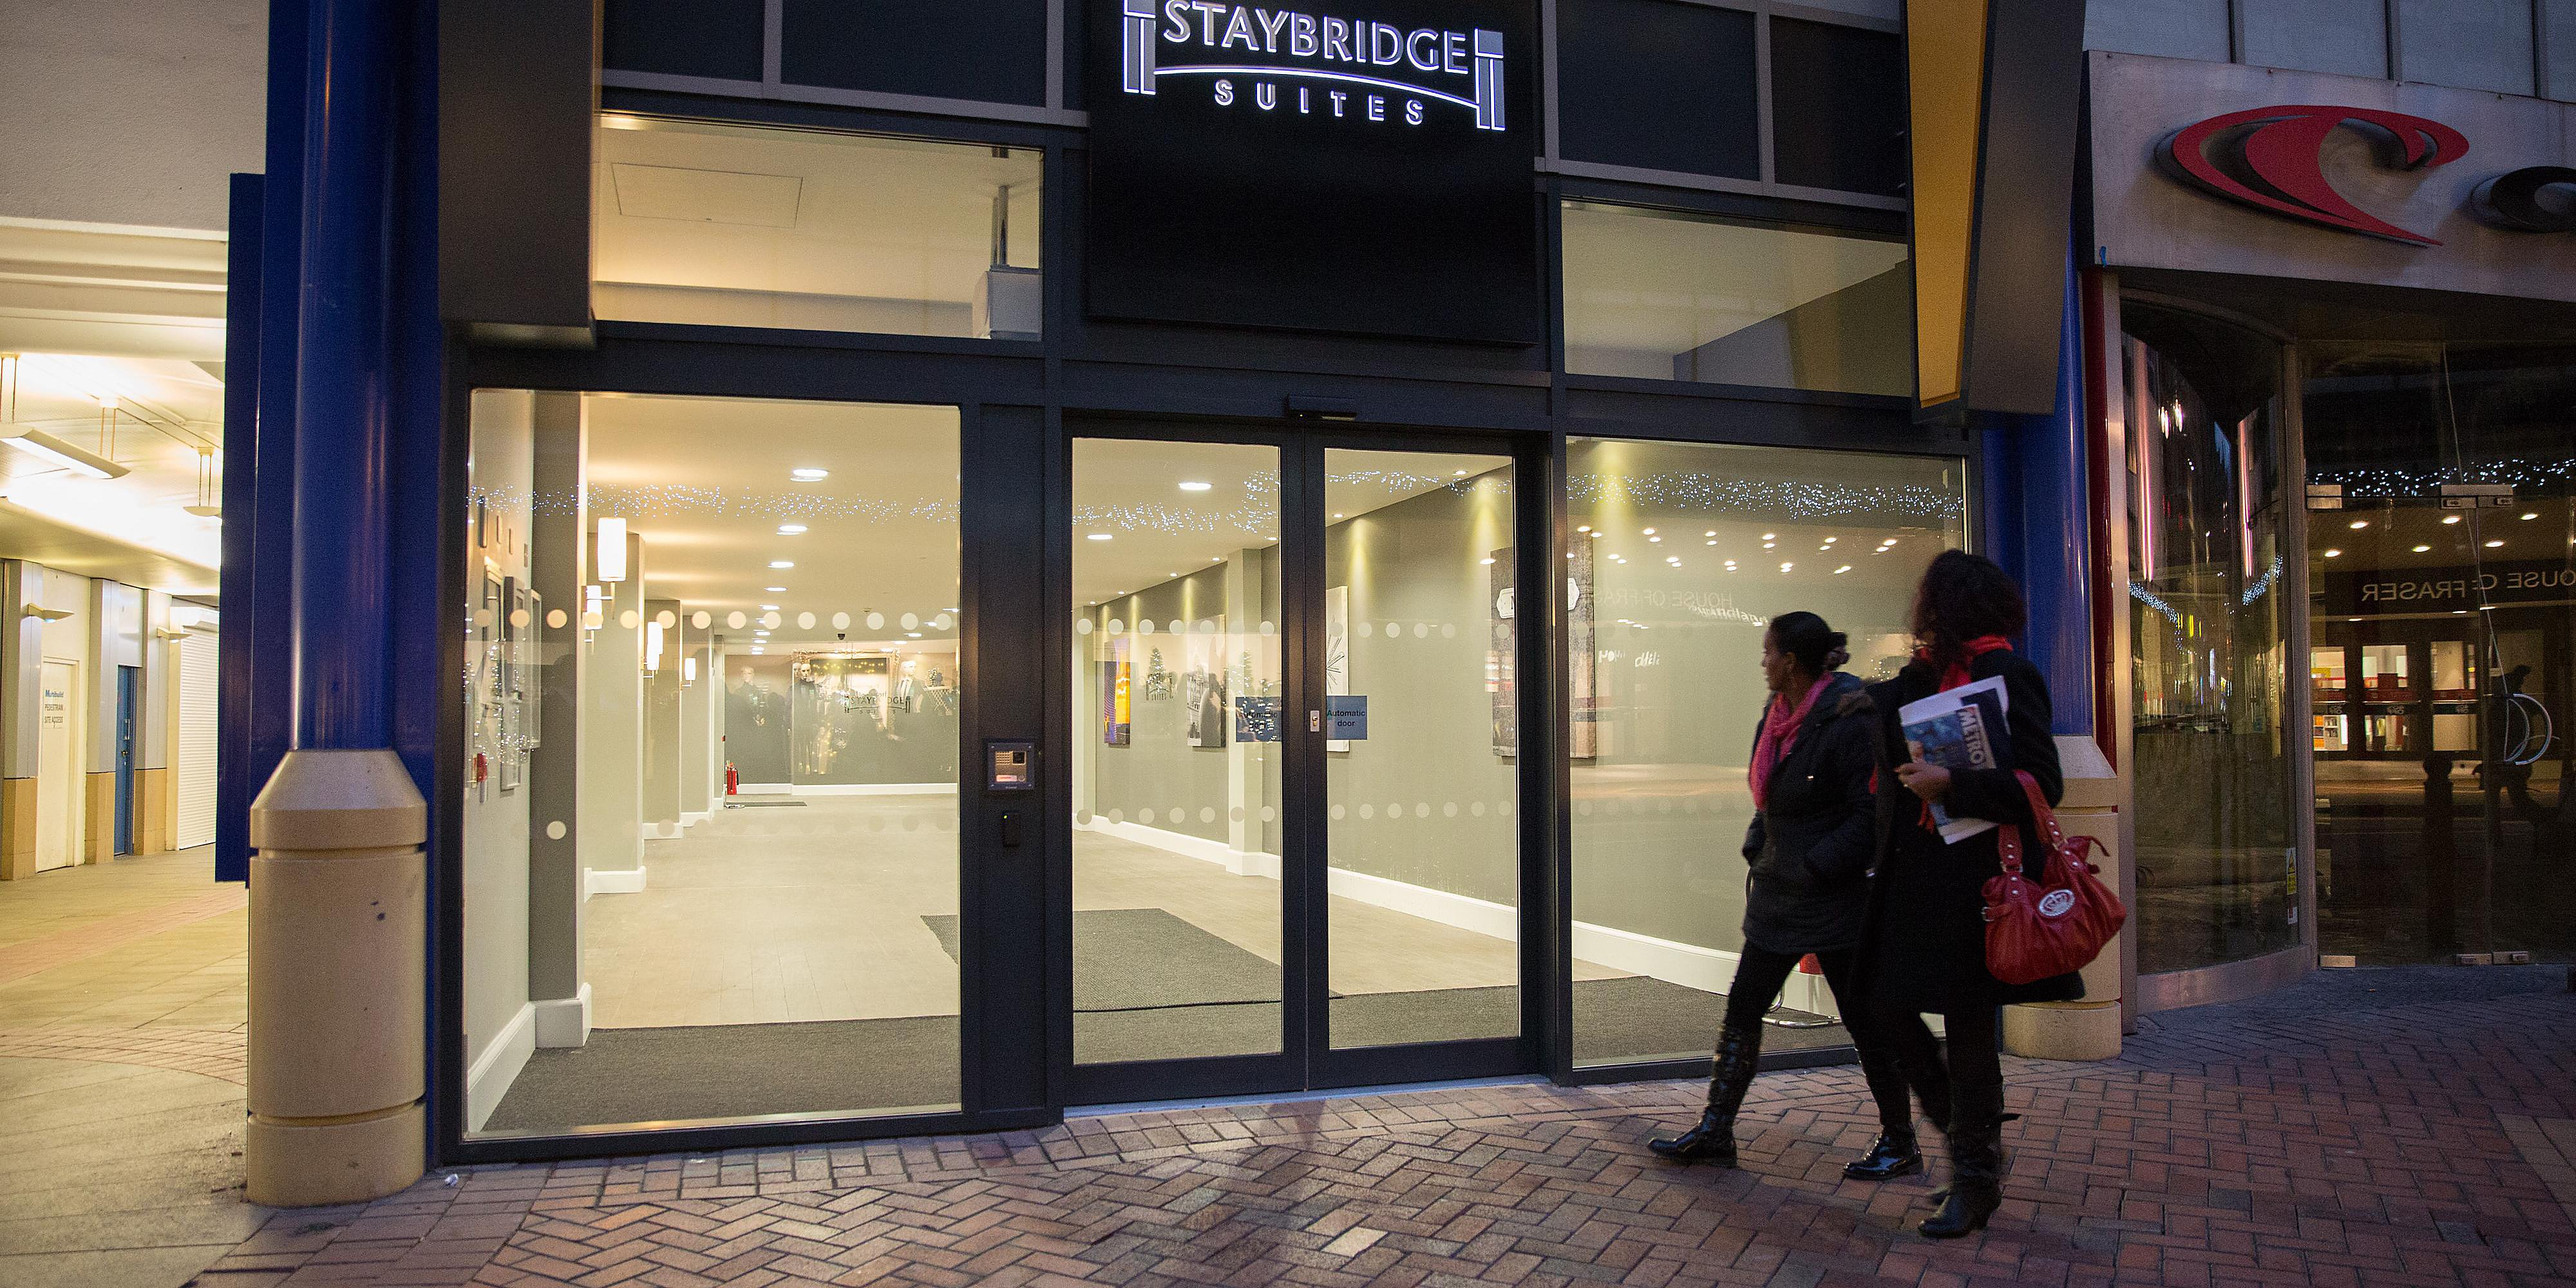 Extended Stay Hotel Staybridge Suites Birmingham Uk